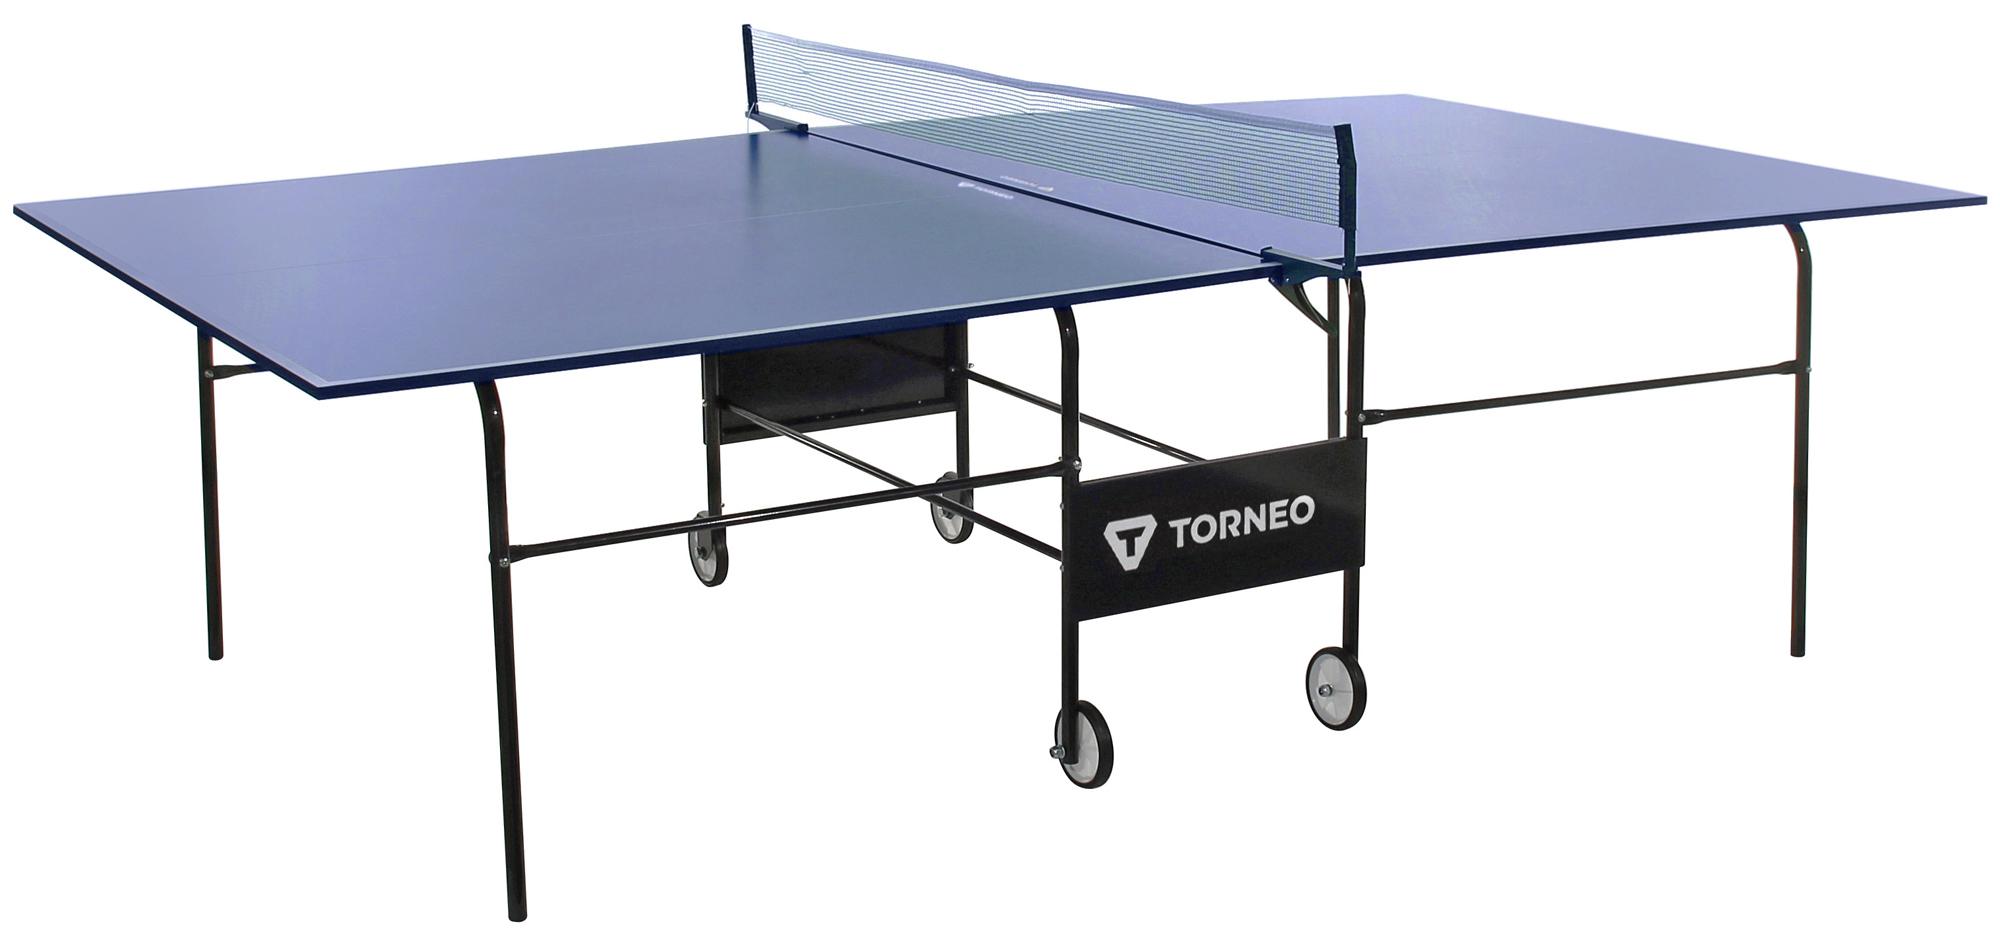 цена на Torneo Теннисный стол для помещений Torneo